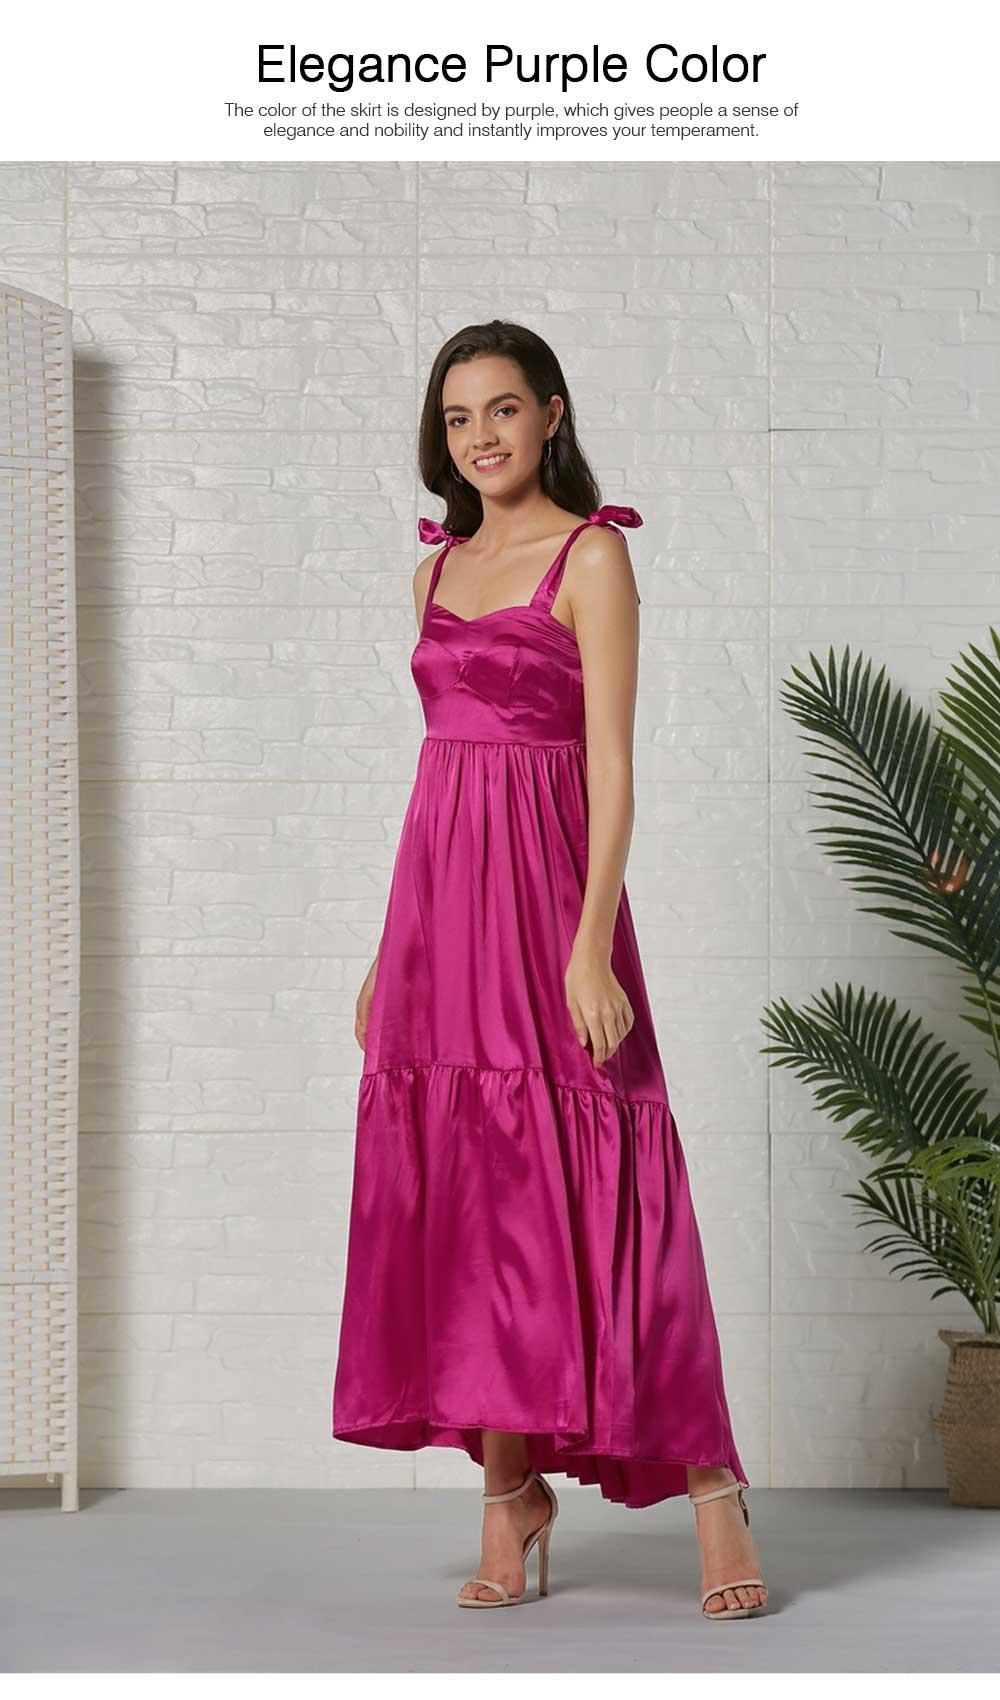 Lady Bohemian Dress Satin Flapper Hem Petticoat Binding Non-sleeve Long Purple Skirt Spring Summer for Women 1